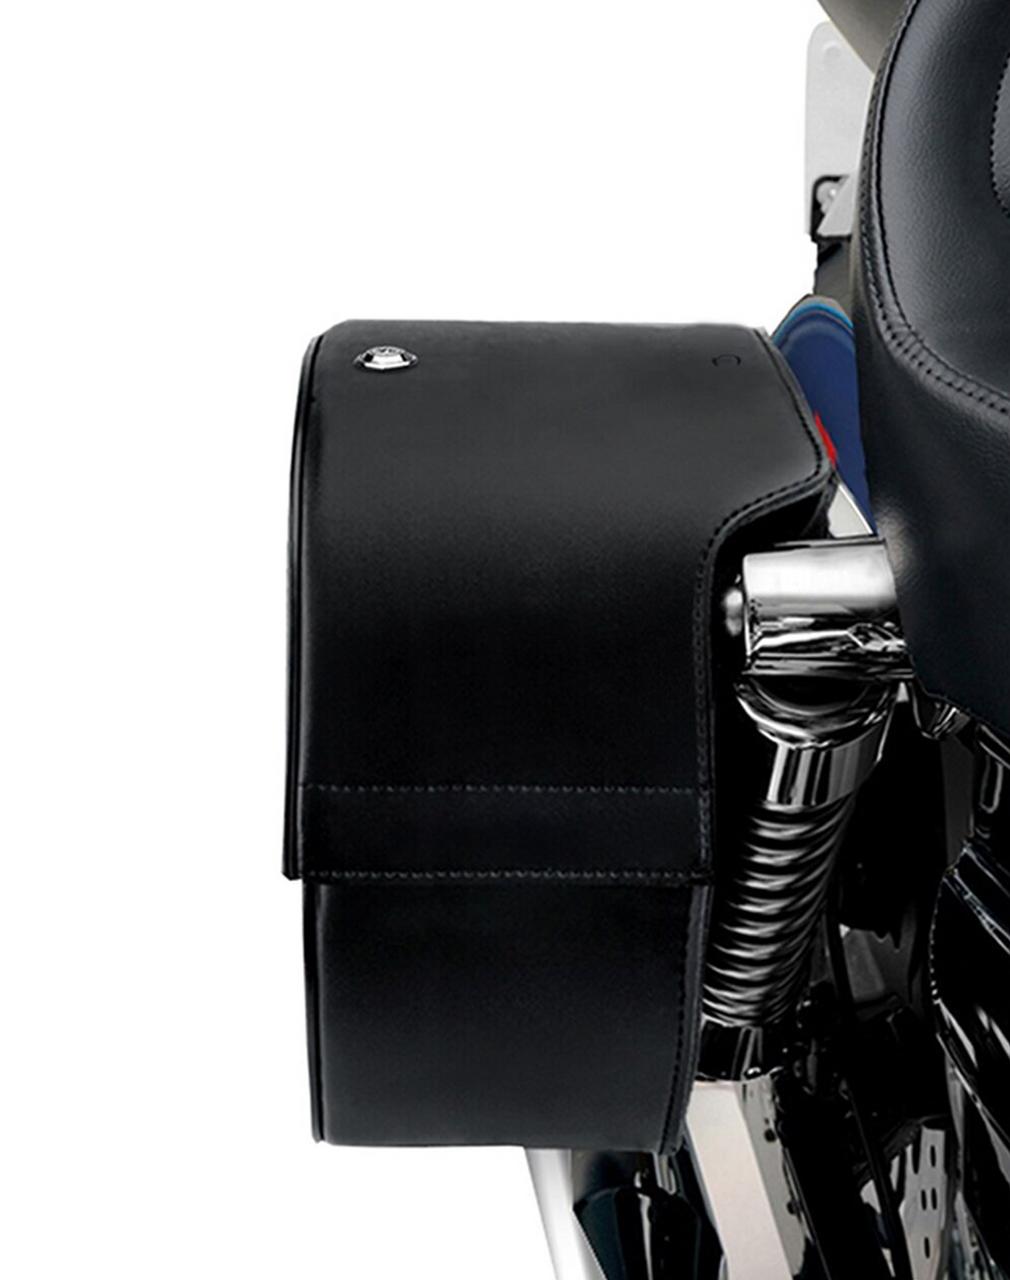 Viking Large Shock Cutout Warrior Slanted Motorcycle Saddlebags For Harley Sportster 1200 Nightster XL1200N Shock cutout view